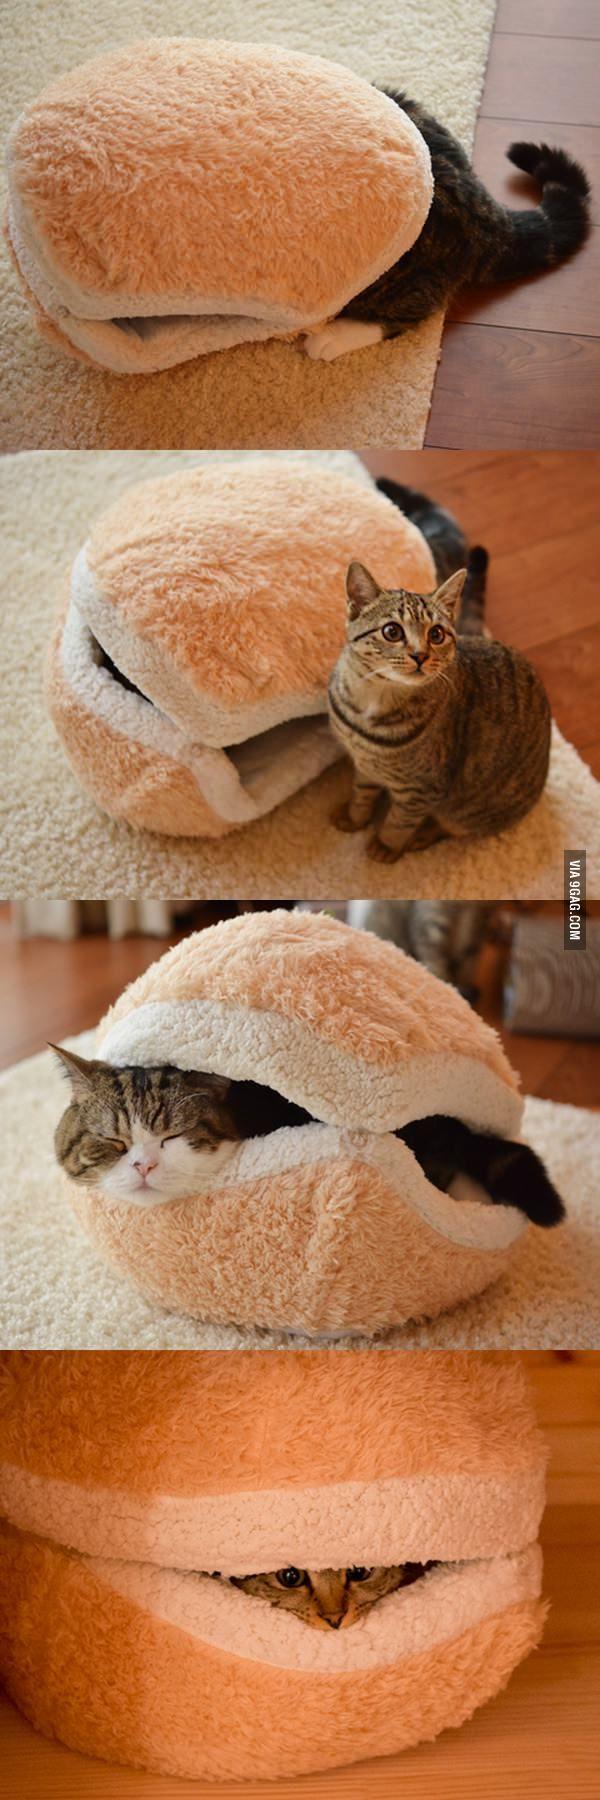 Cat Burger!